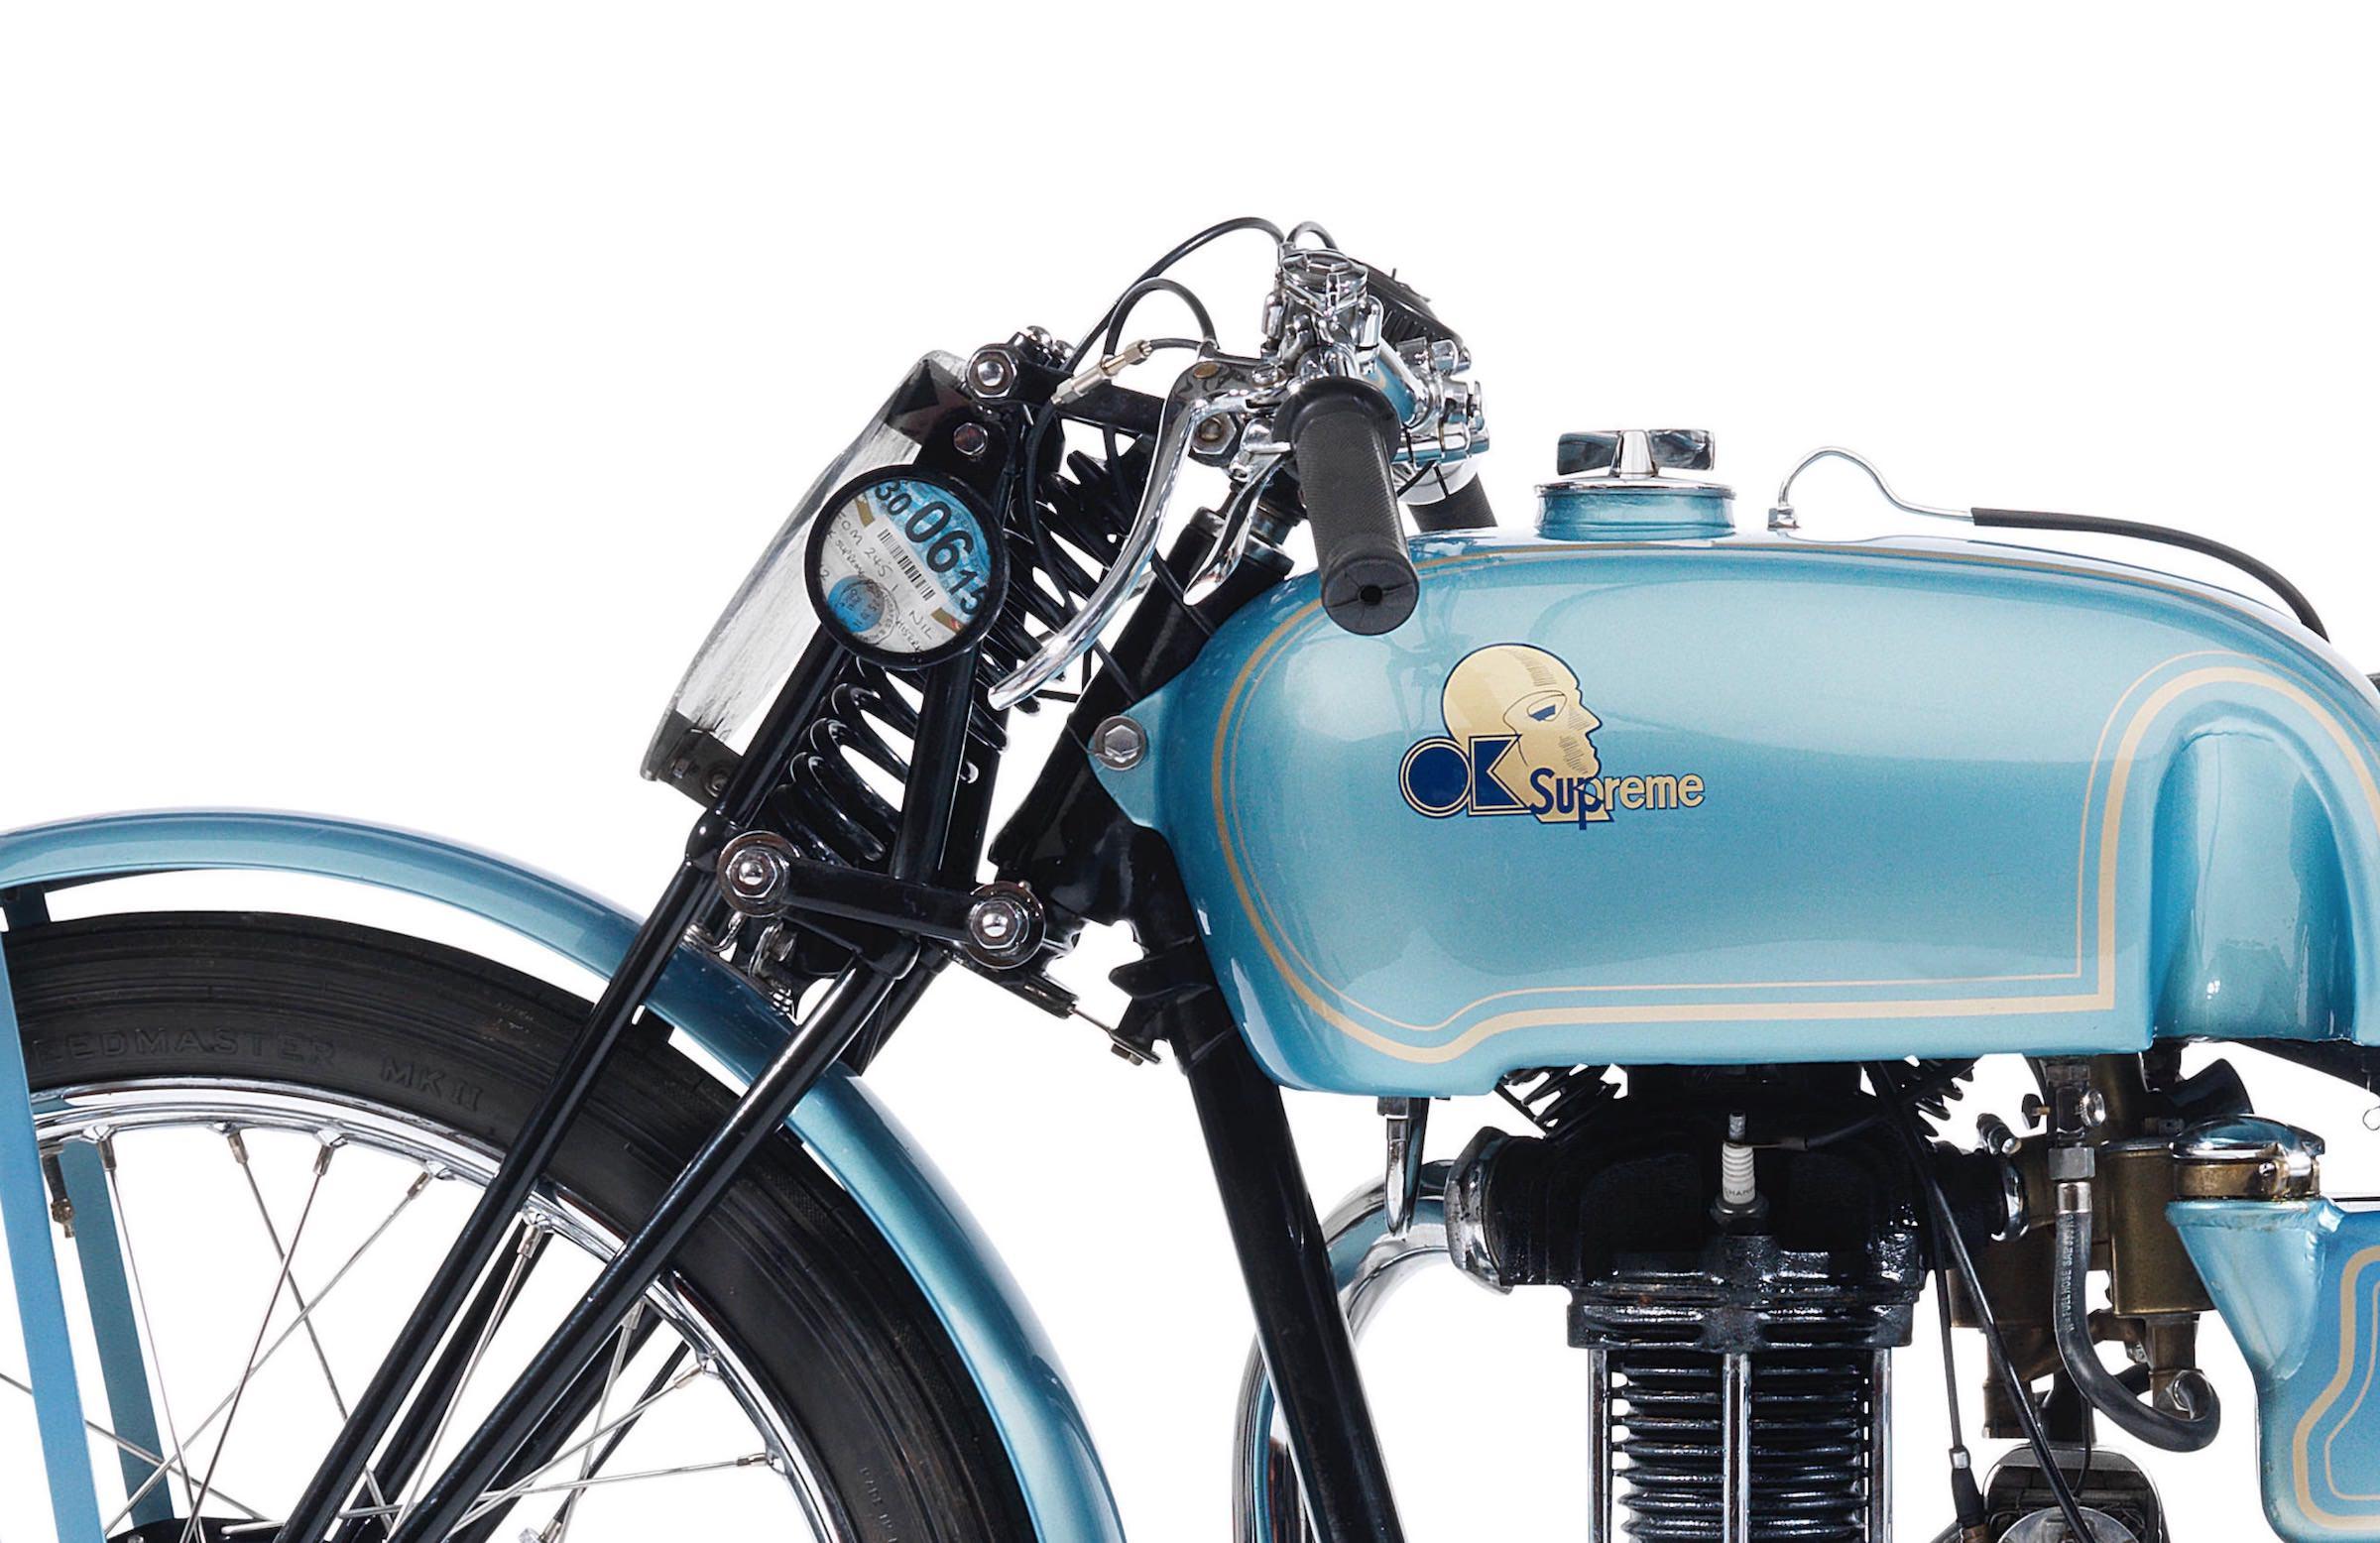 OK-Supreme Motorcycle Logo